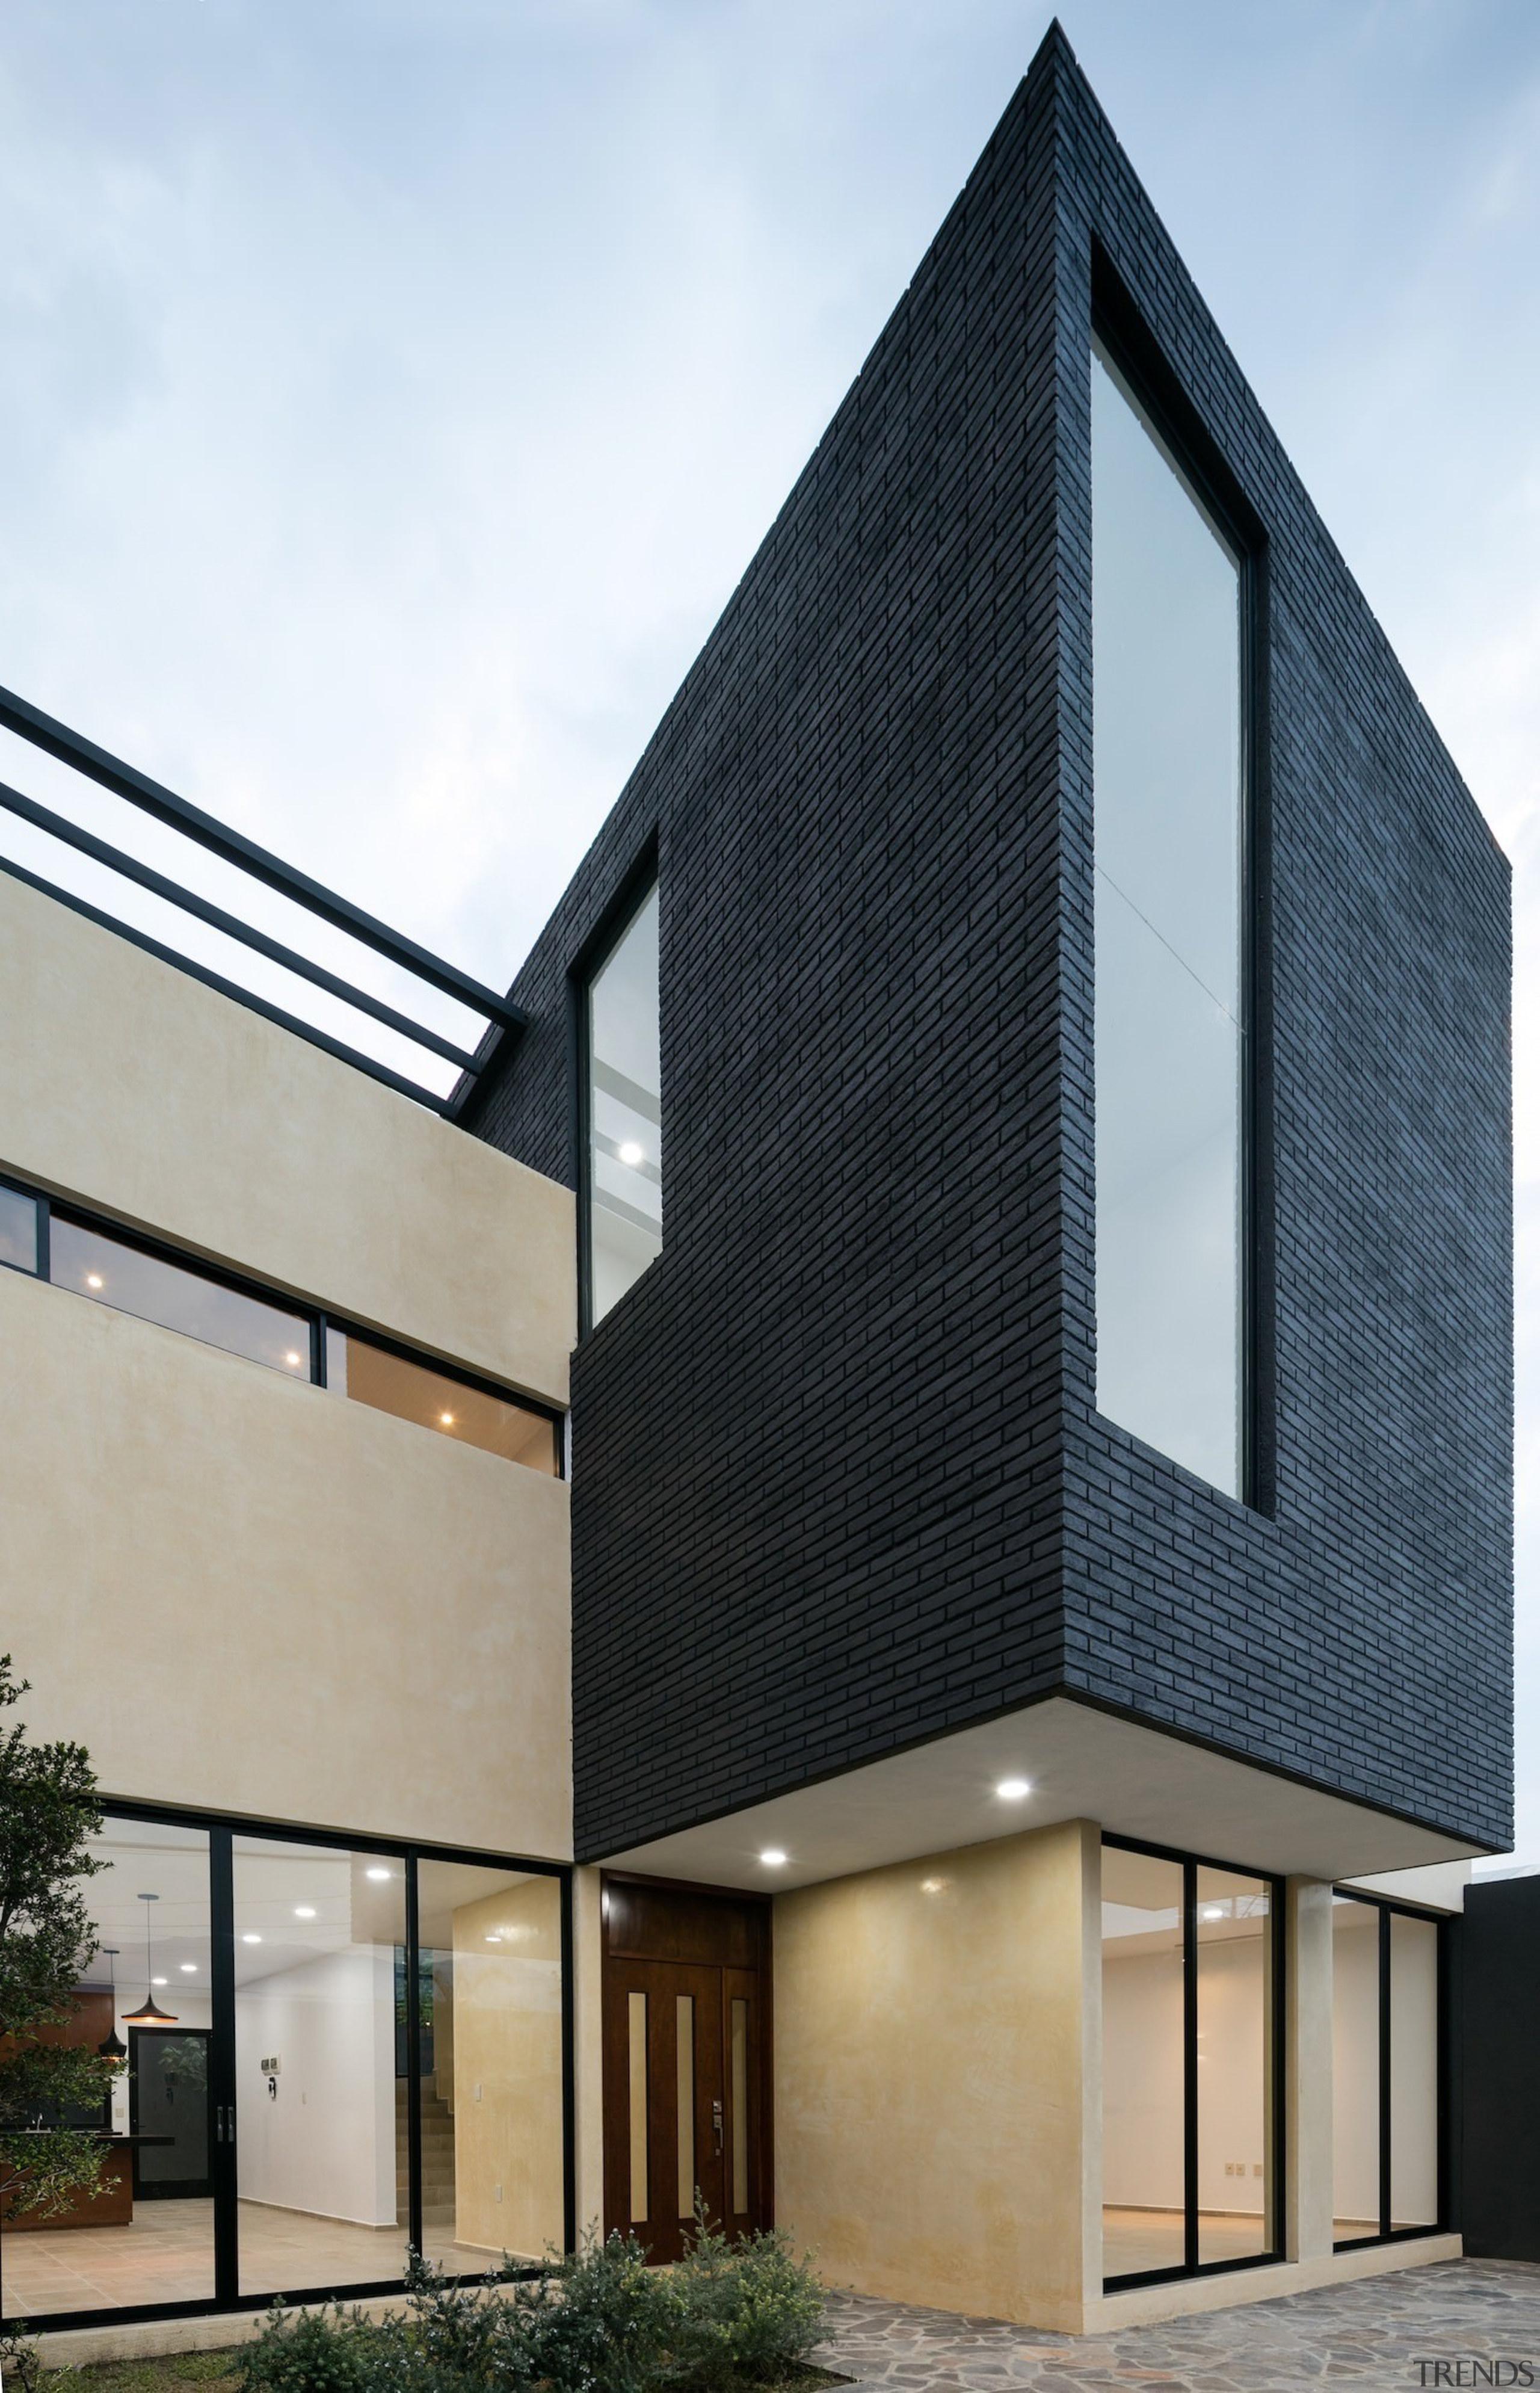 Architect: Espacio 18 ArquitecturaPhotography by Lorena Darquea architecture, building, commercial building, corporate headquarters, elevation, facade, home, house, real estate, siding, window, white, black